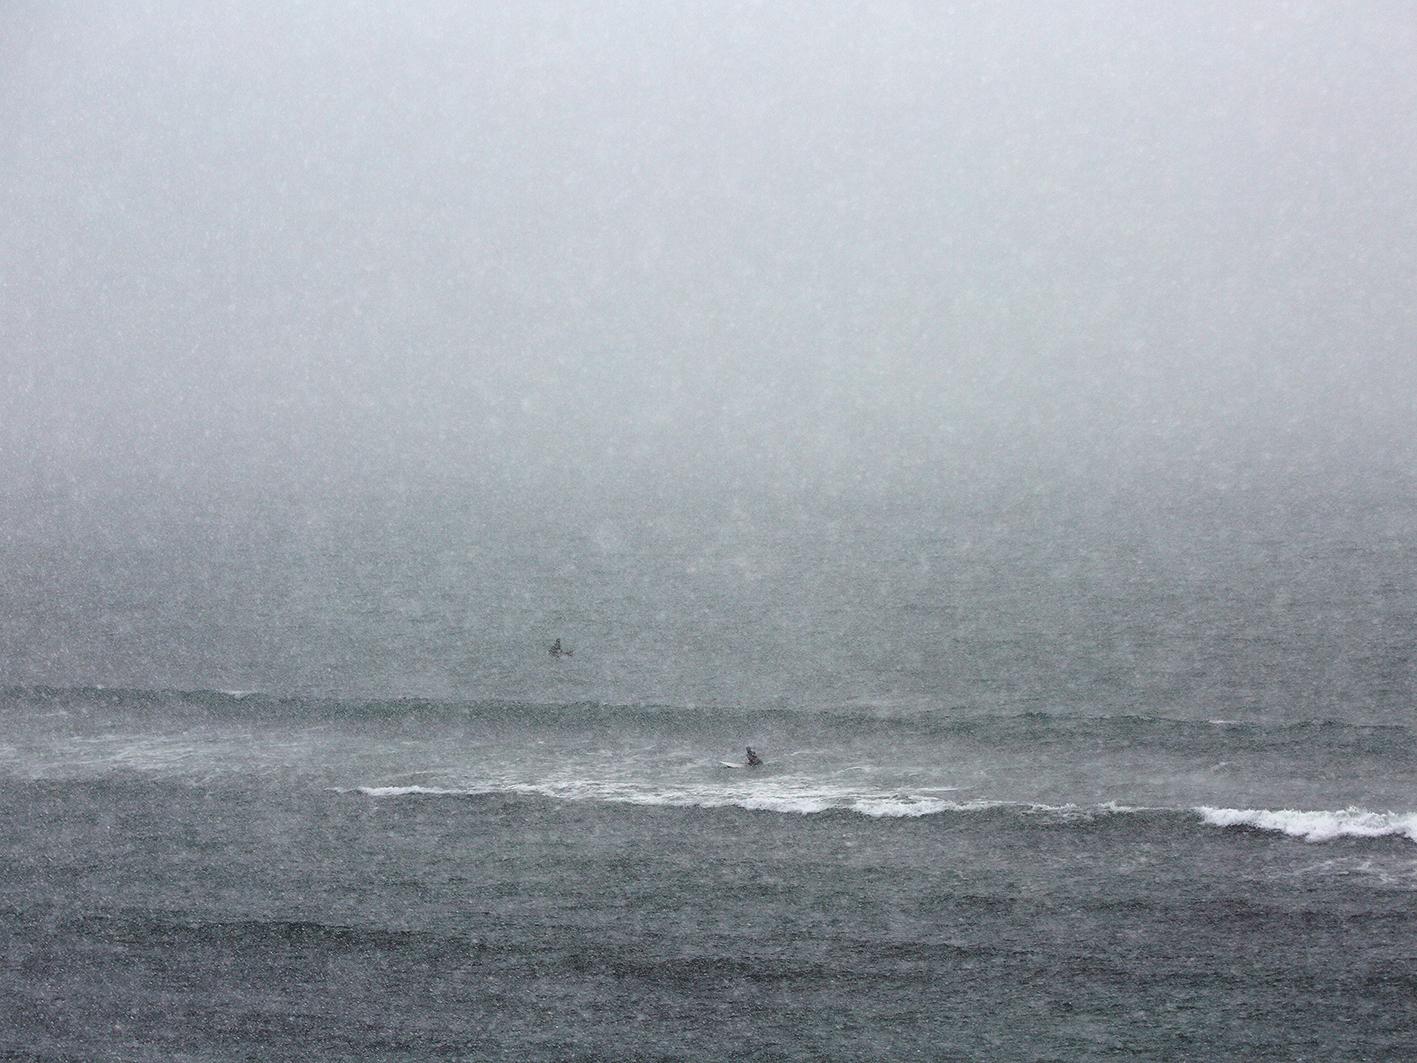 Skubatz_Arctic_Surfers_57.jpg